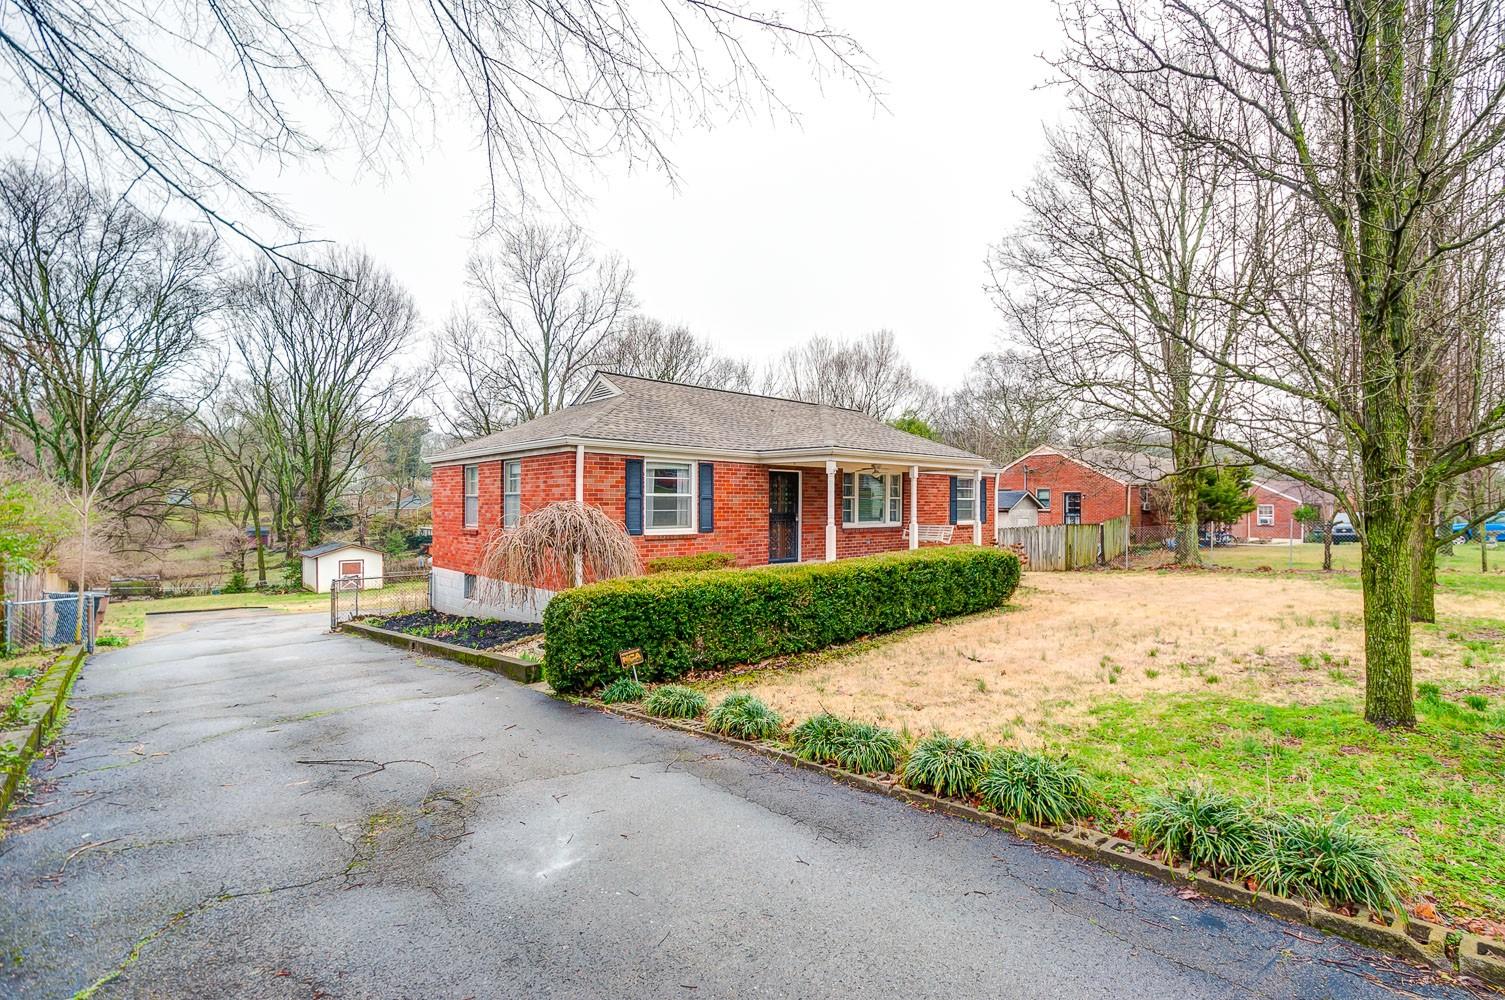 149 McCall St, Nashville, TN 37211 - Nashville, TN real estate listing